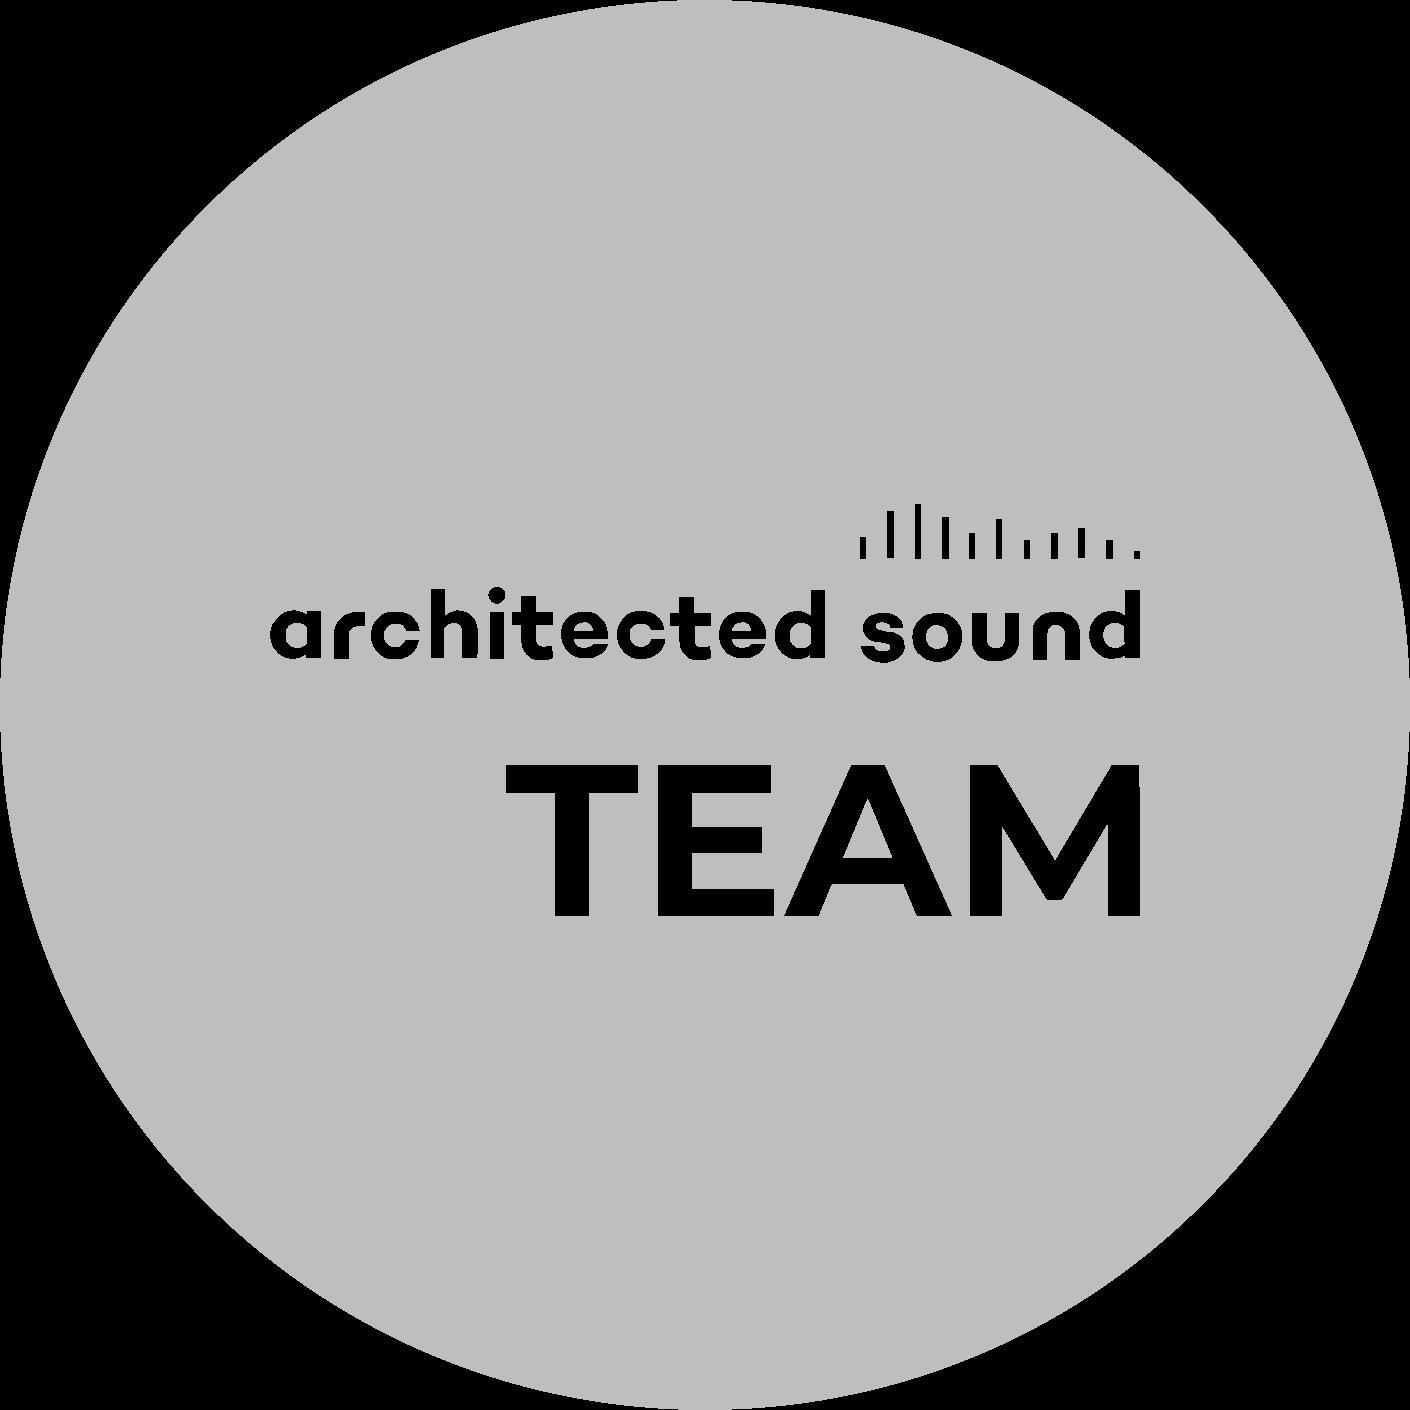 Architected Sound Team